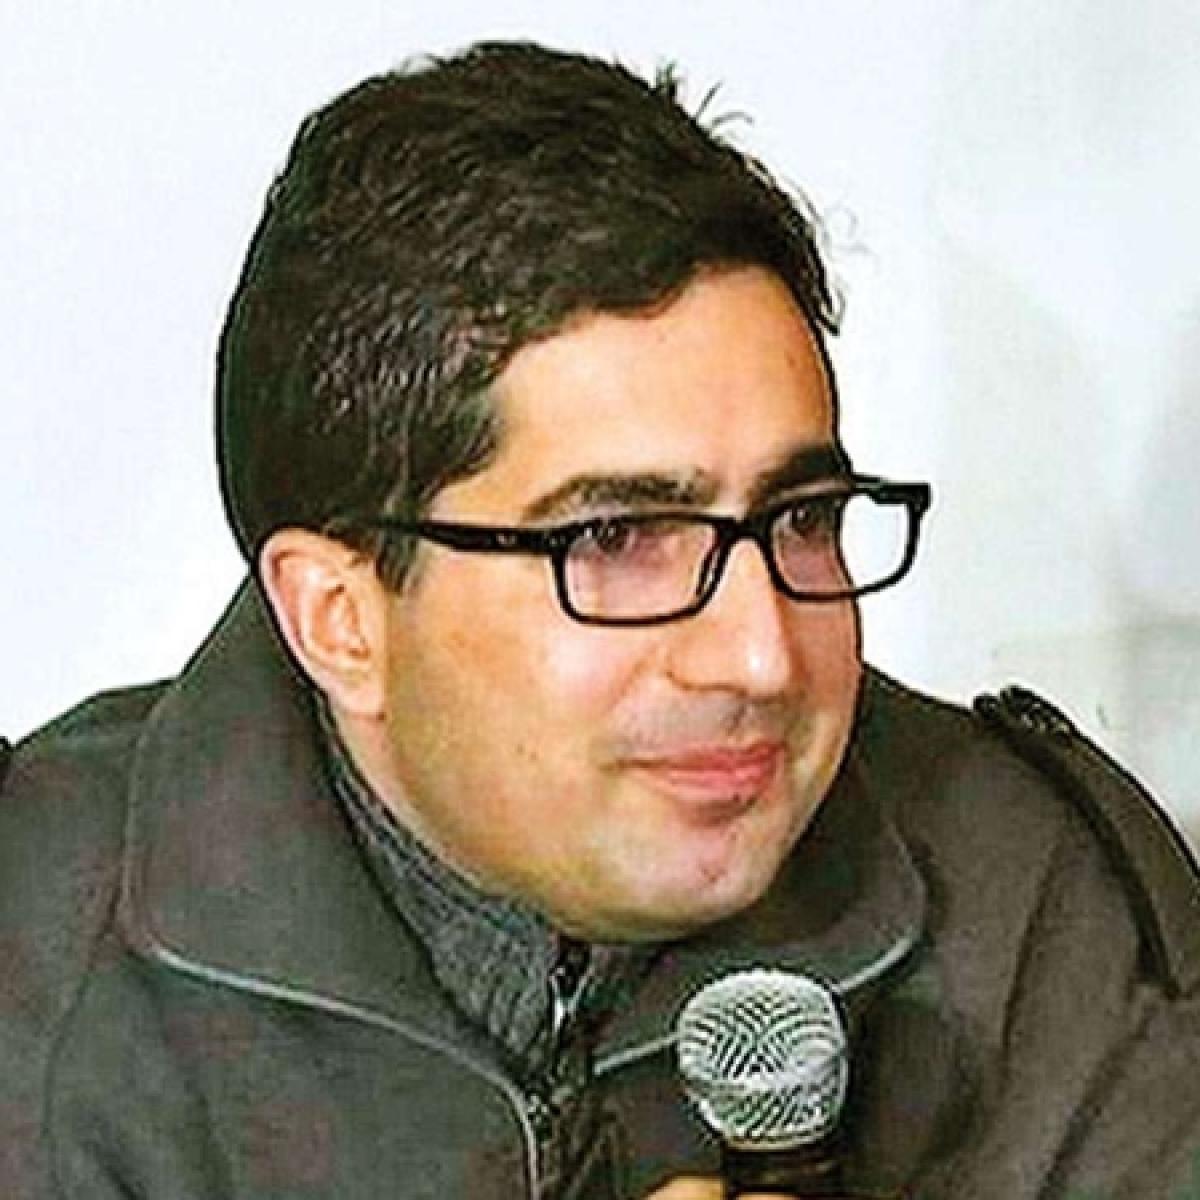 J&K: Centre's response sought by Delhi HC on Shah Faesal's plea challenging his detention